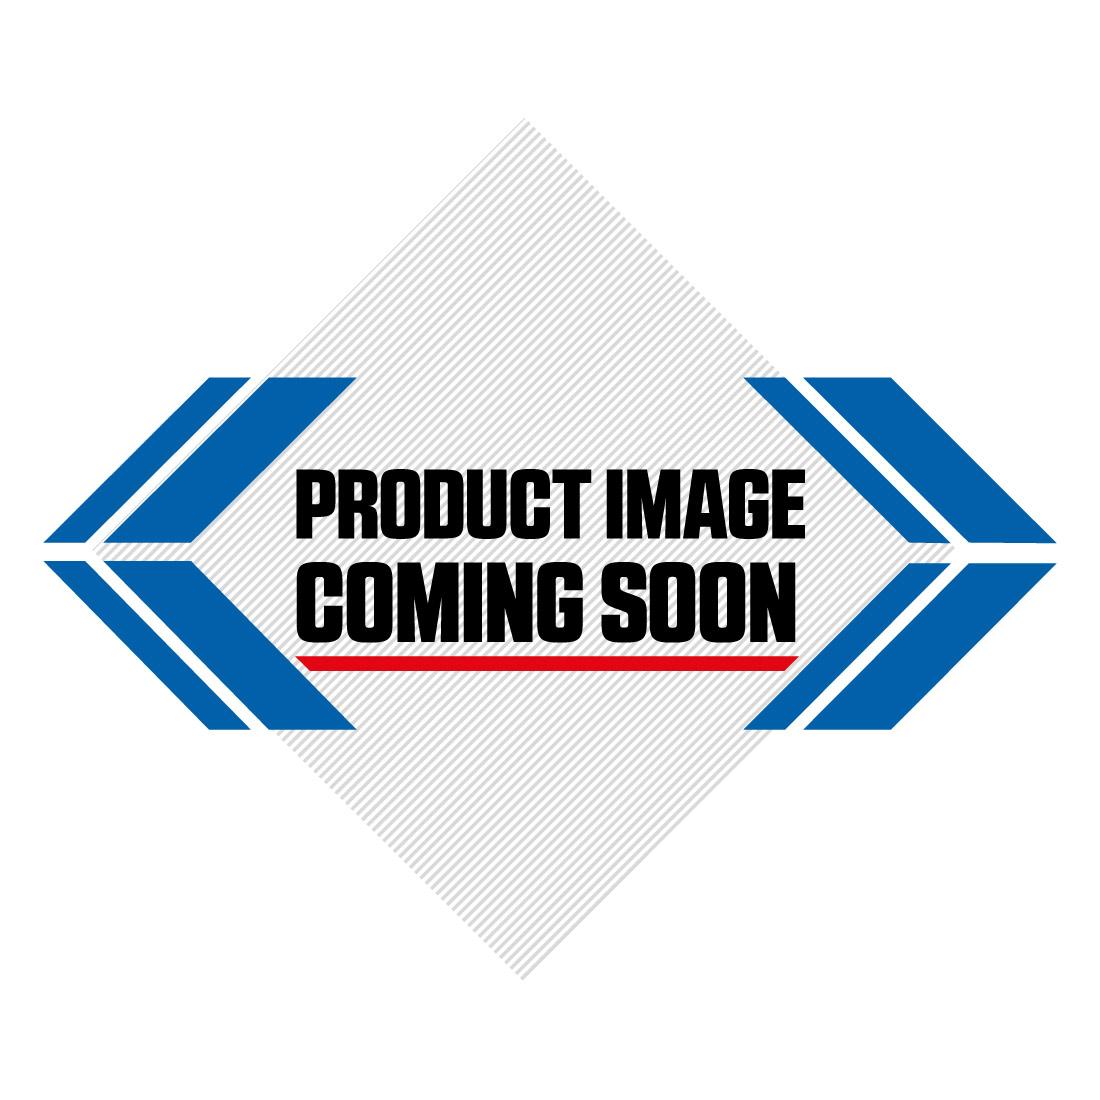 DJI Mavic Pro Fly More Combo 4K Quadcopter Drone Image-7>